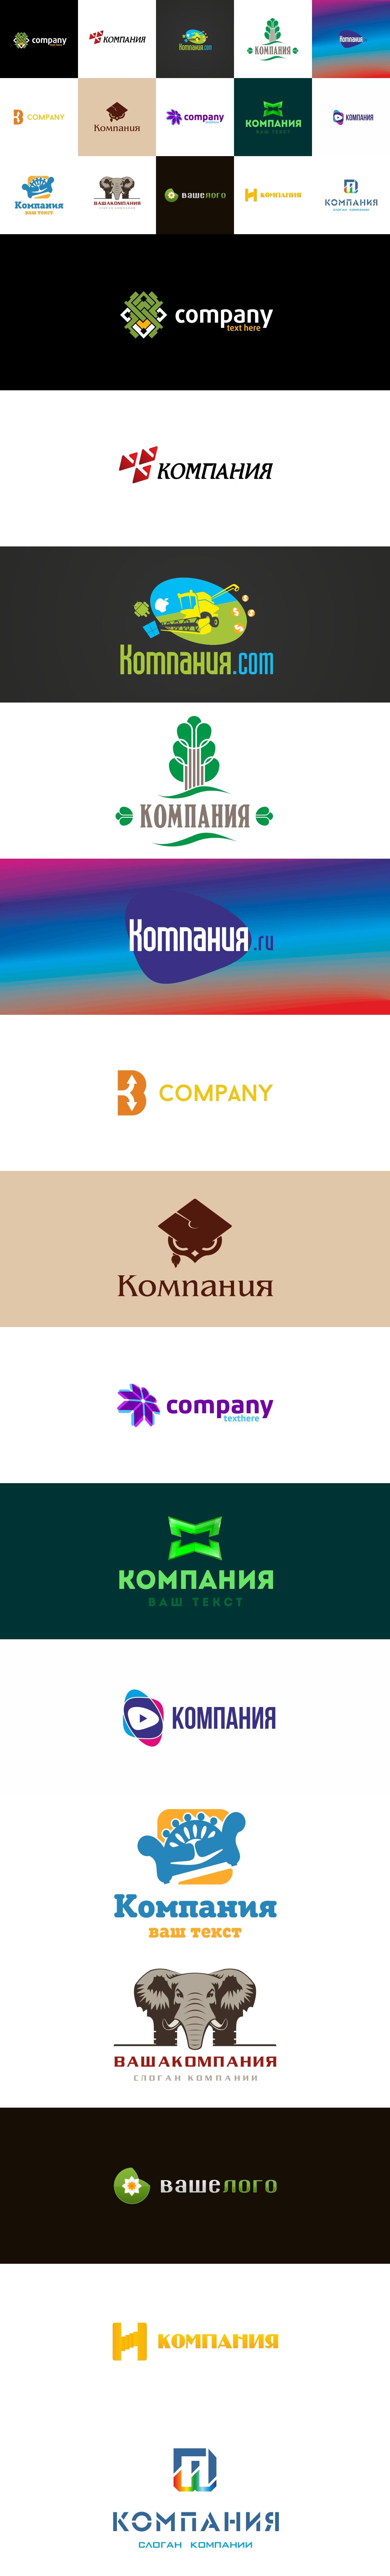 logoset logosale Logotip logo sale Collection logos company buy